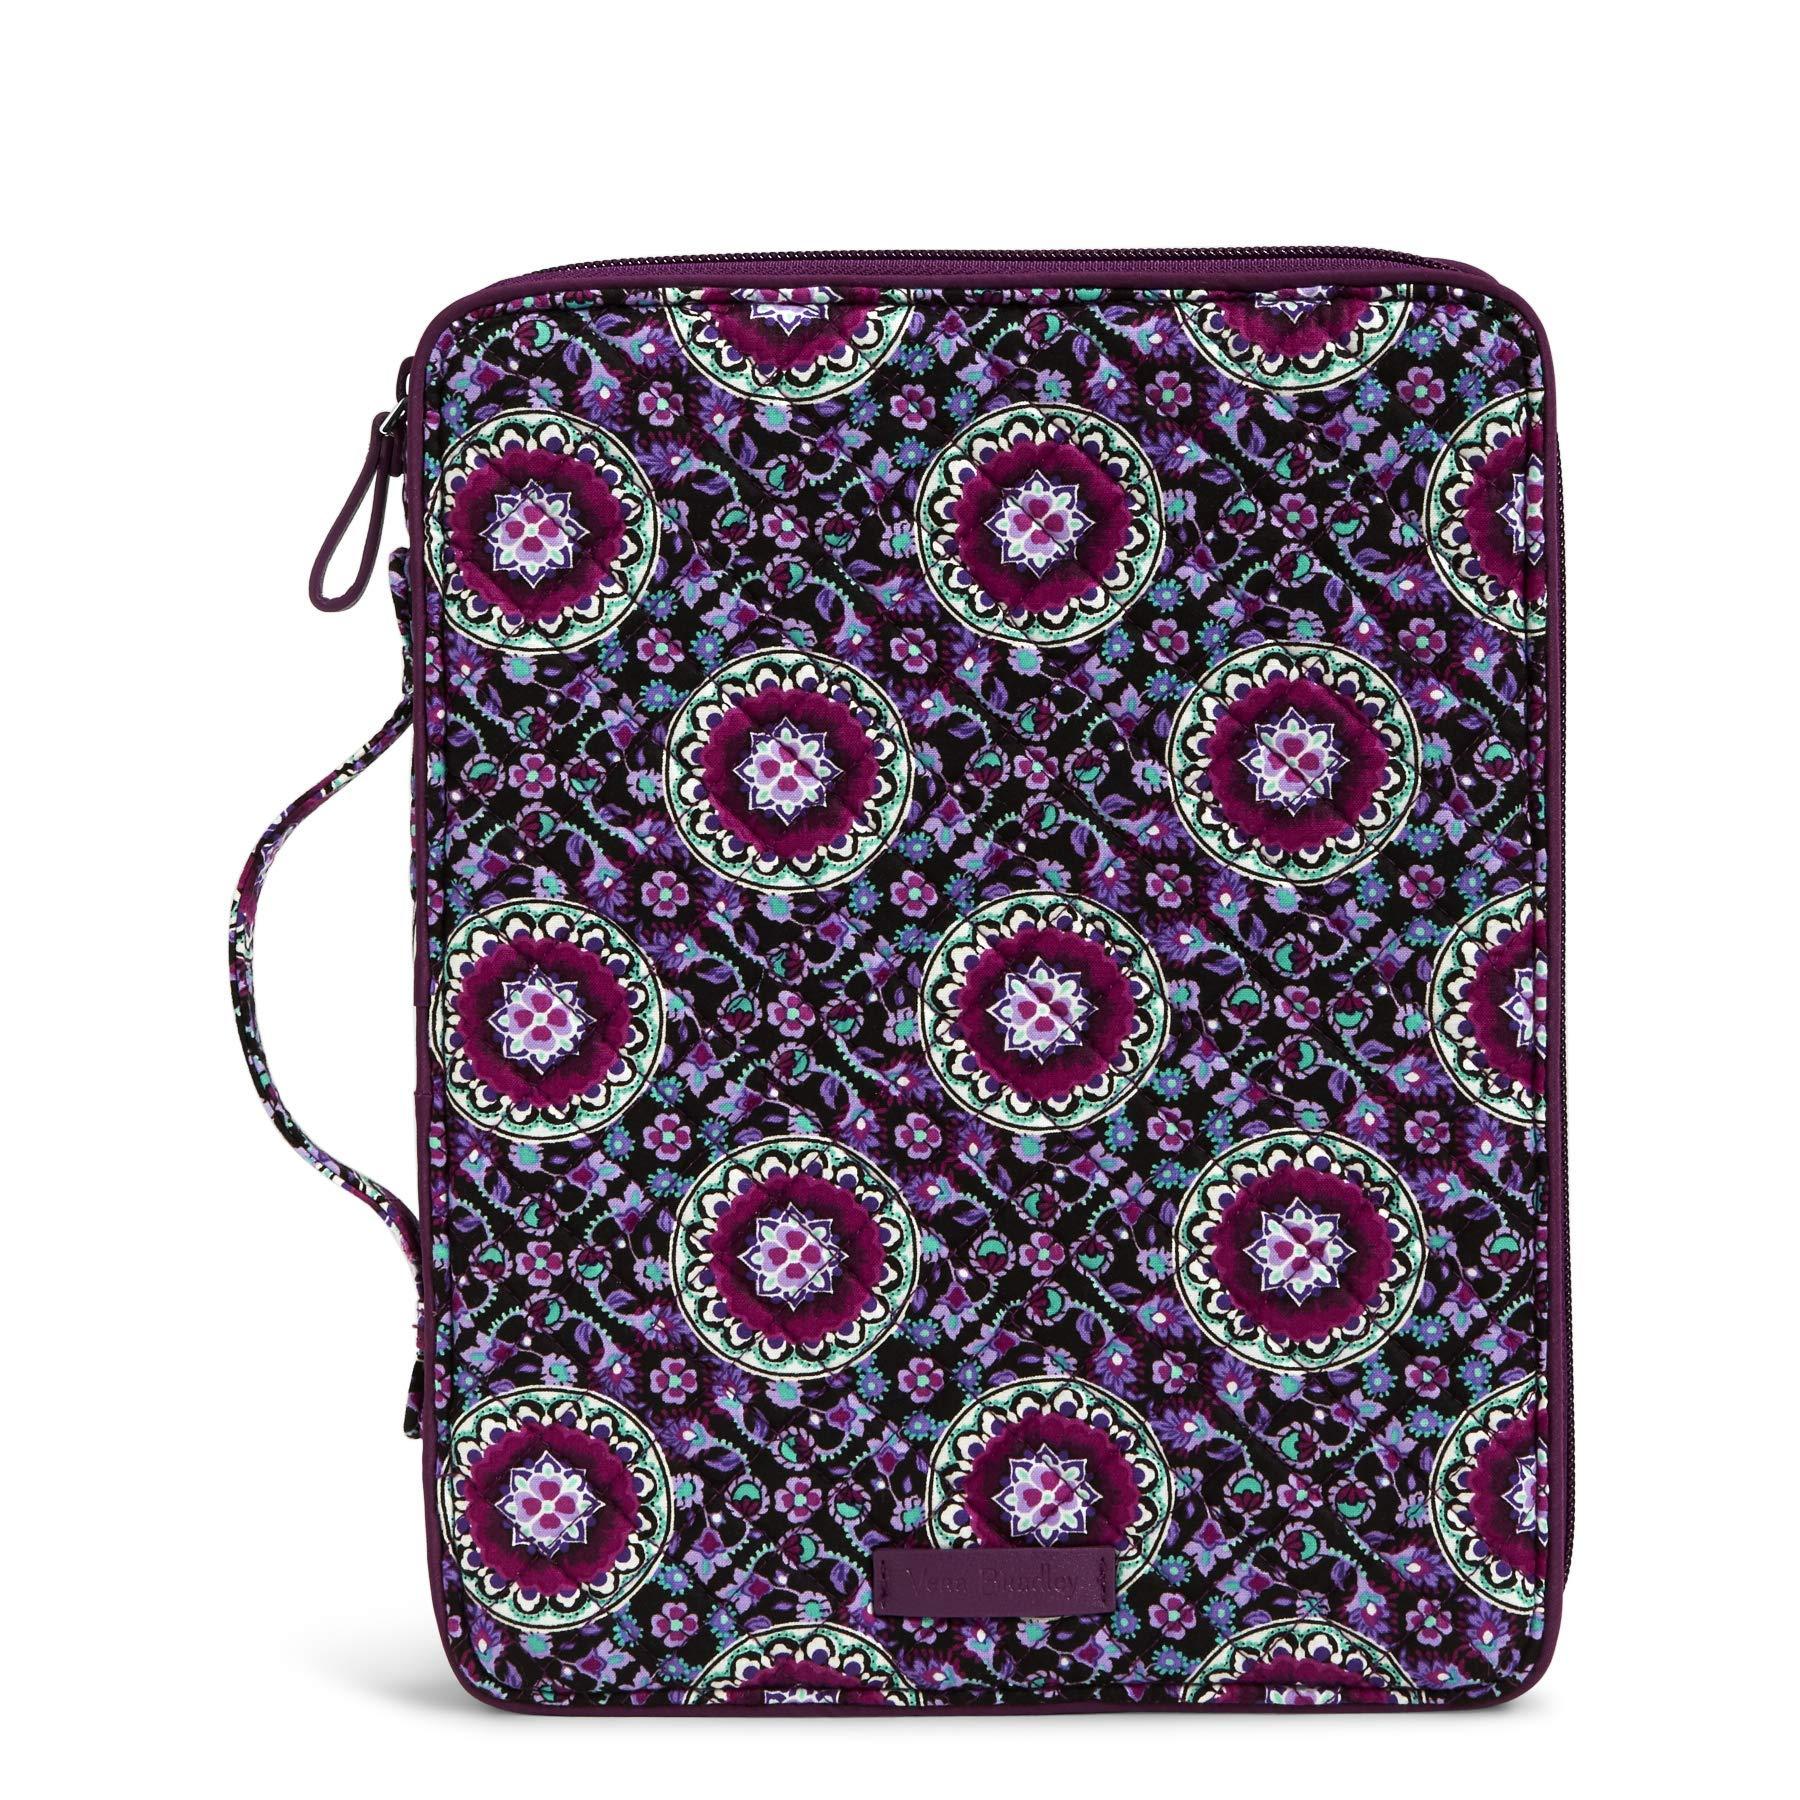 Vera Bradley Iconic Tablet Tamer Organizer - Signature Messenger Bag Bag